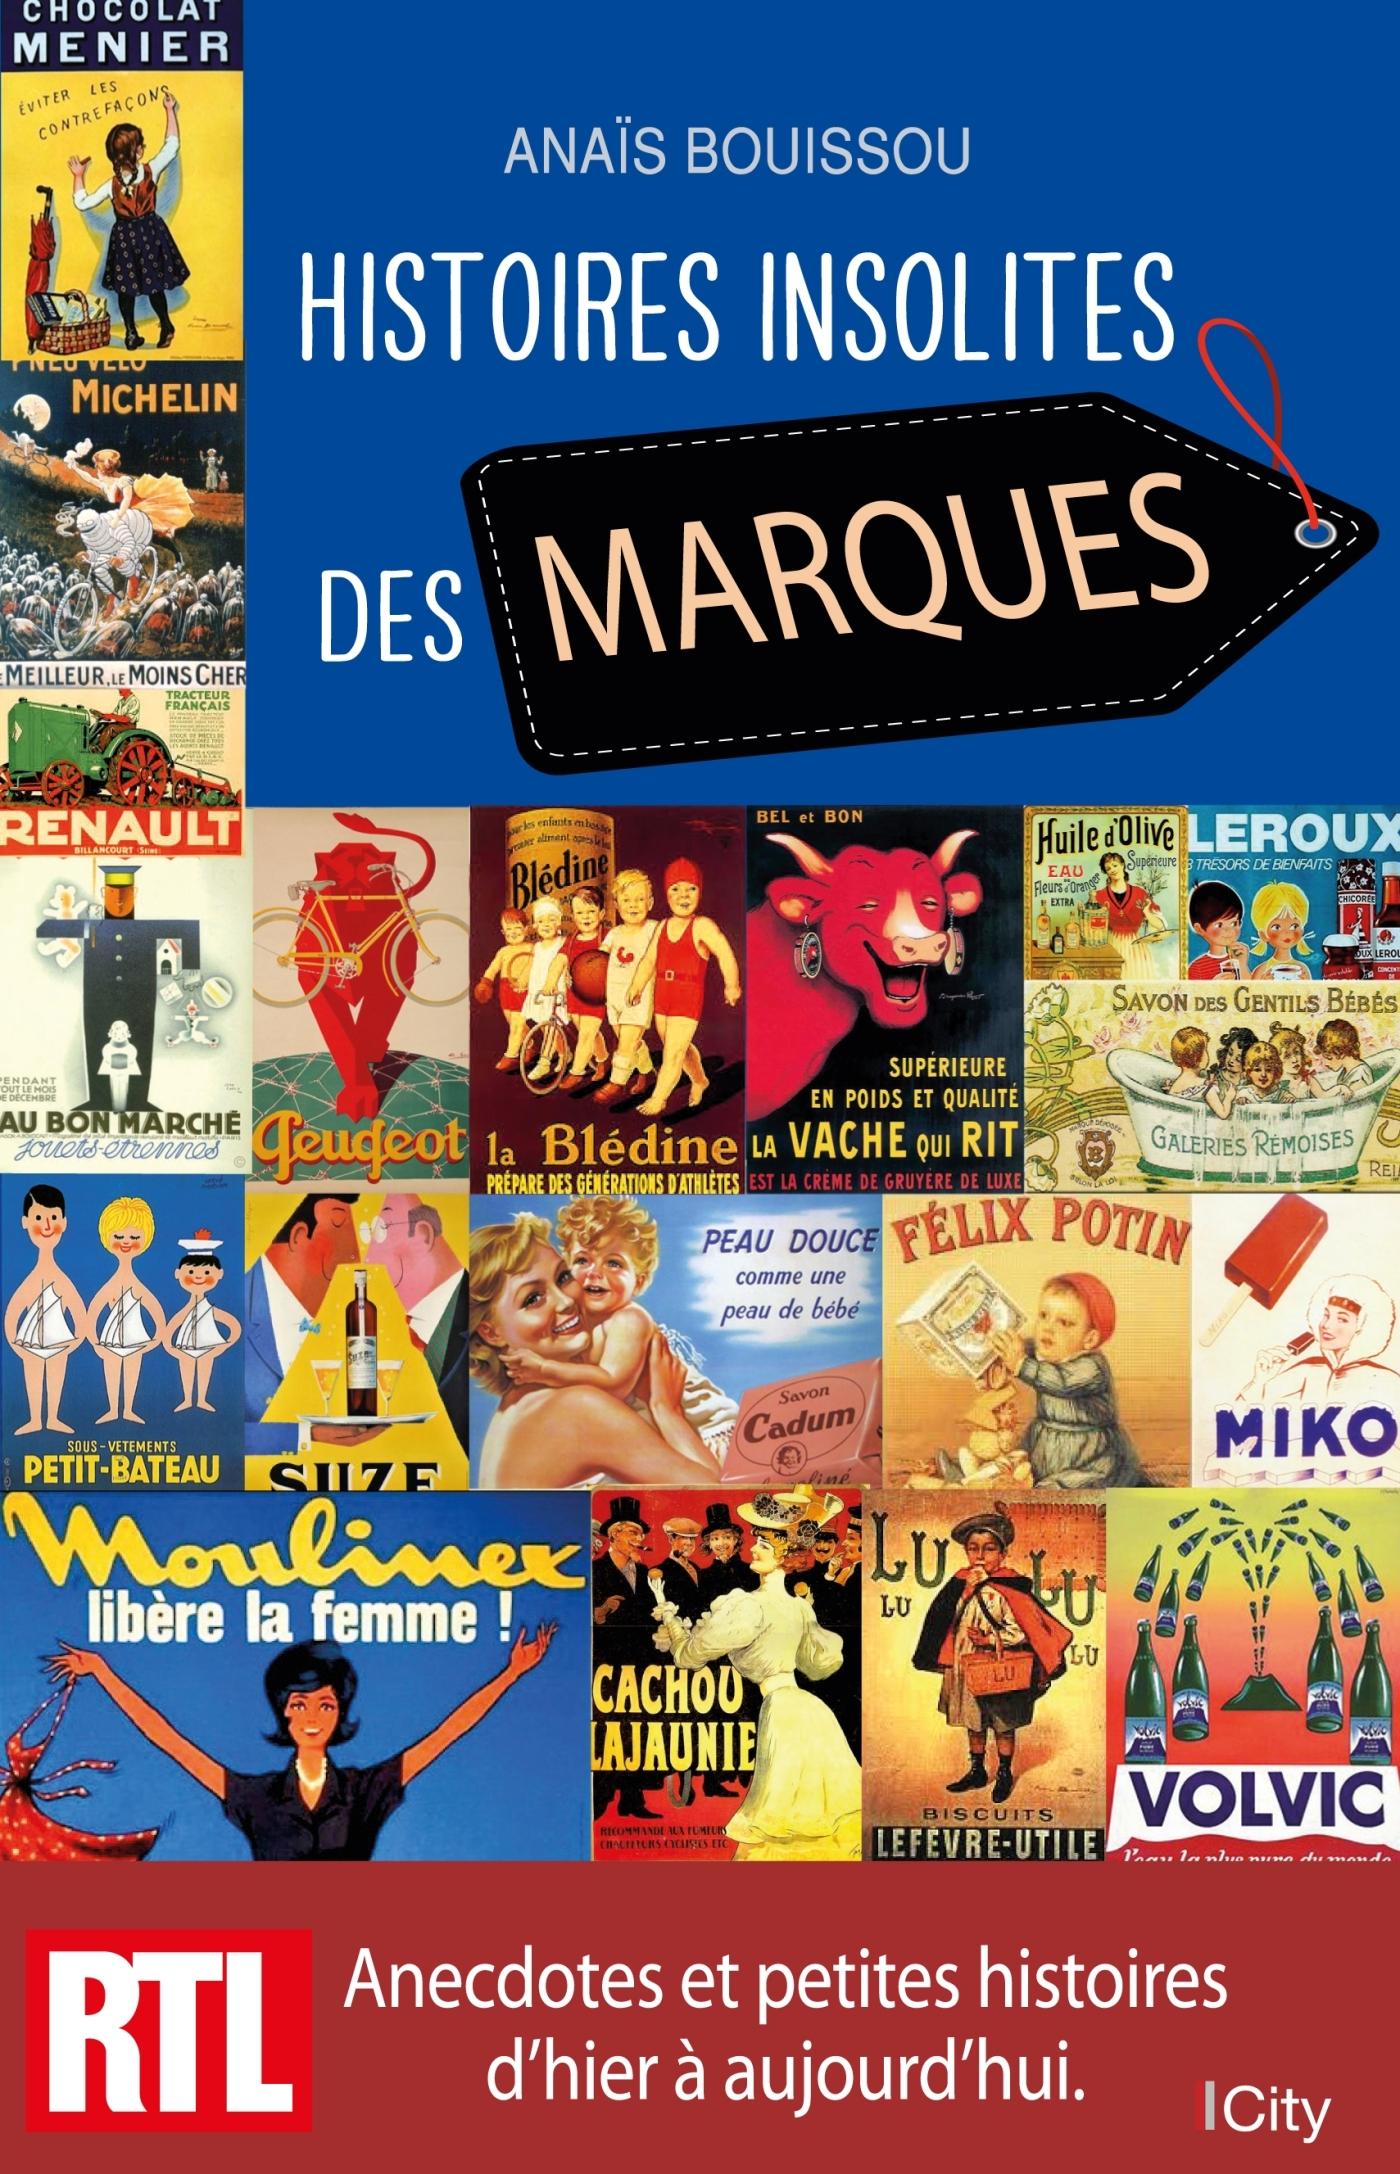 HISTOIRES INSOLITES DES MARQUES